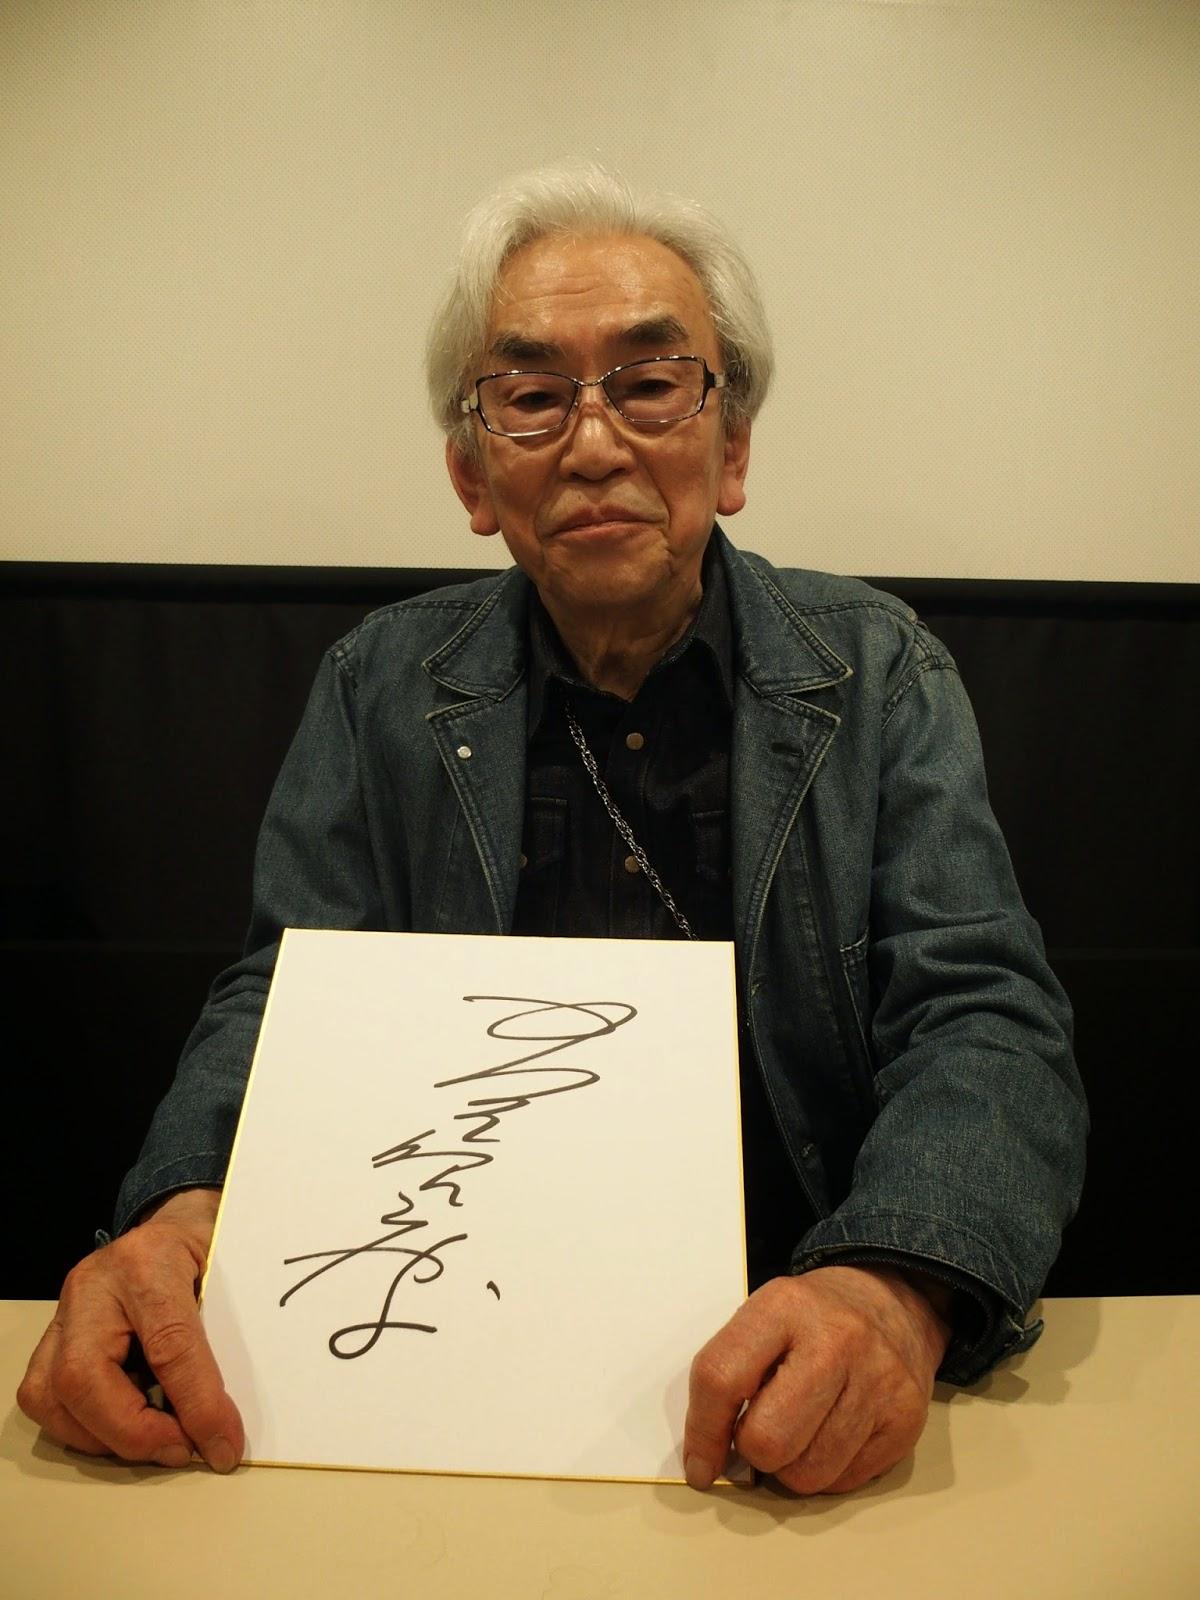 https://vignette4.wikia.nocookie.net/godzilla/images/7/72/Teruyoshi_Nakano.JPG/revision/latest?cb=20150802175611